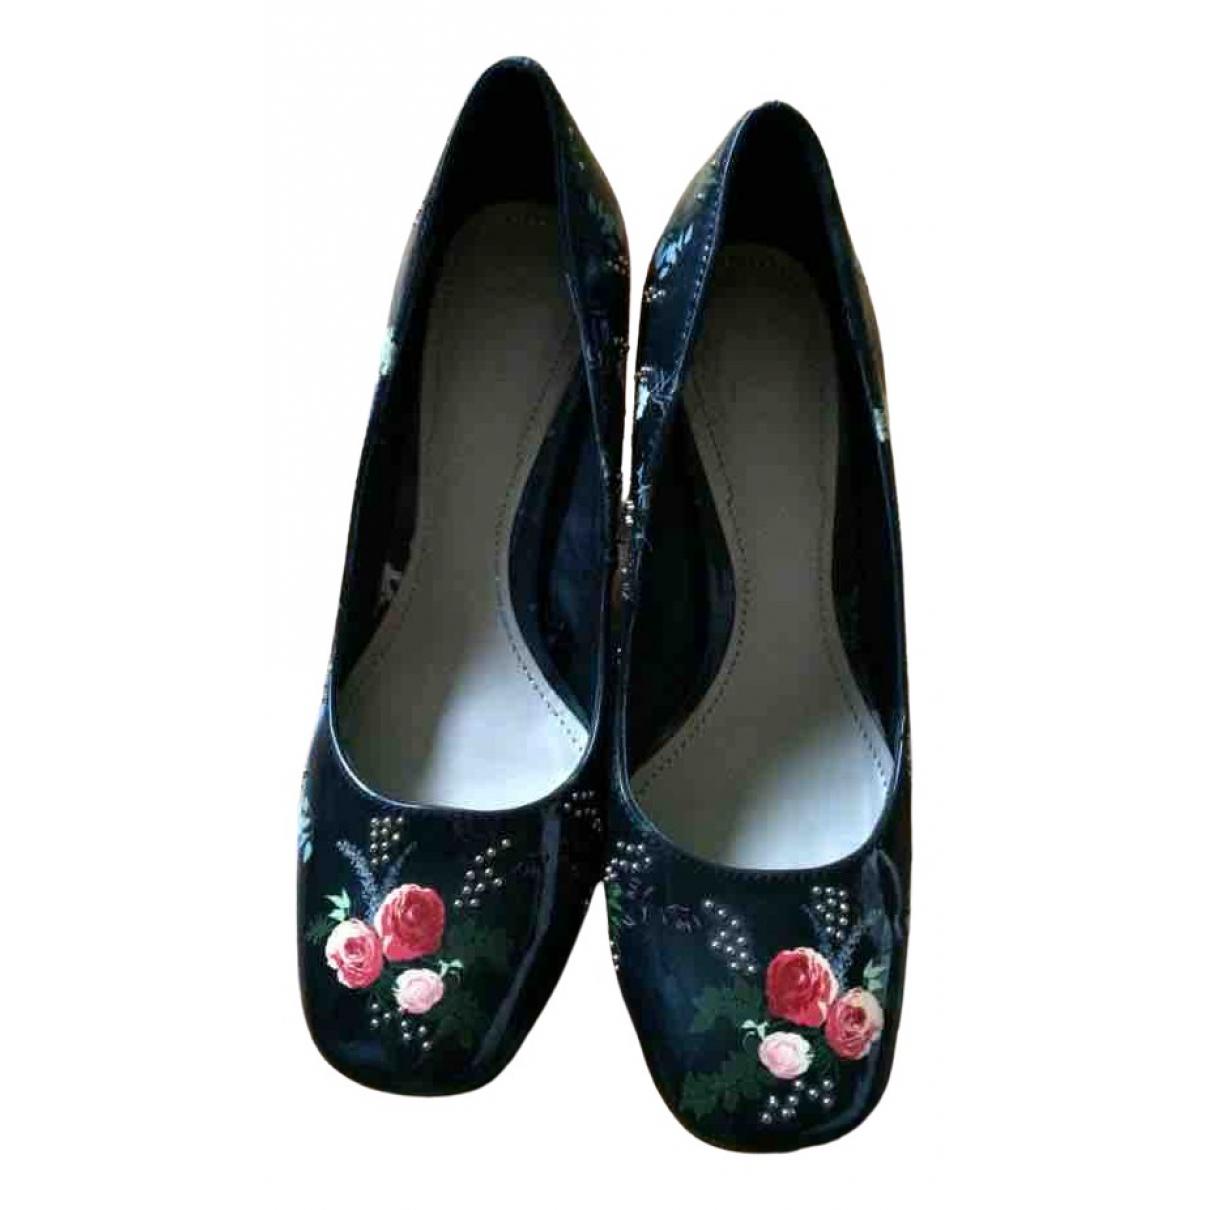 Zara \N Black Patent leather Heels for Women 37 EU